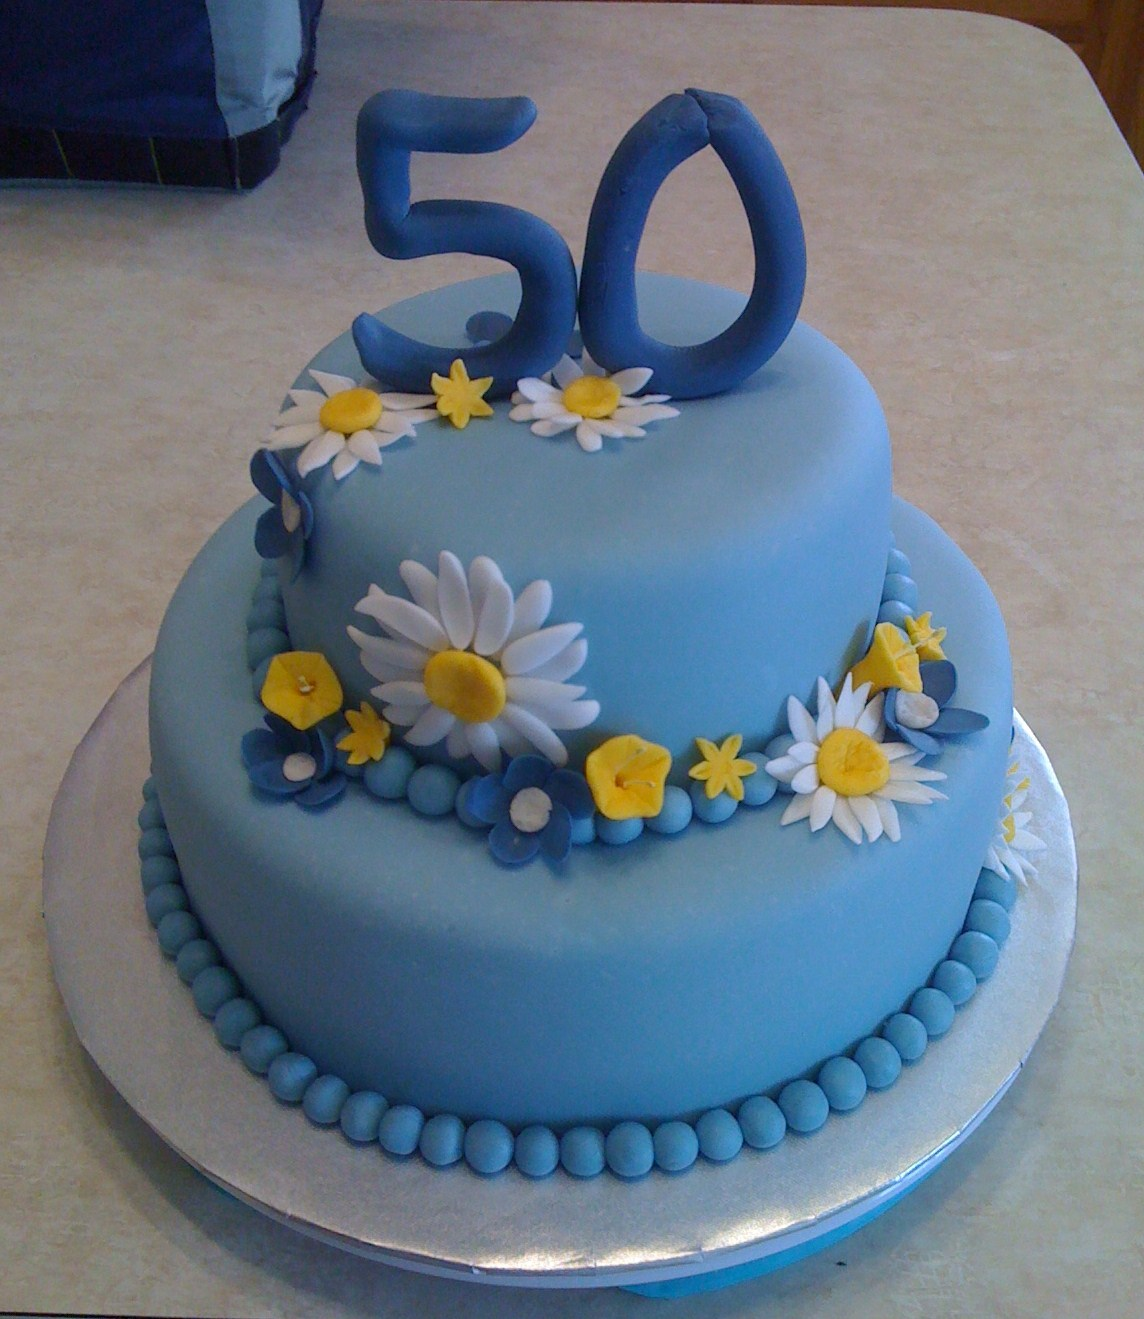 Fifty Birthday Cakes